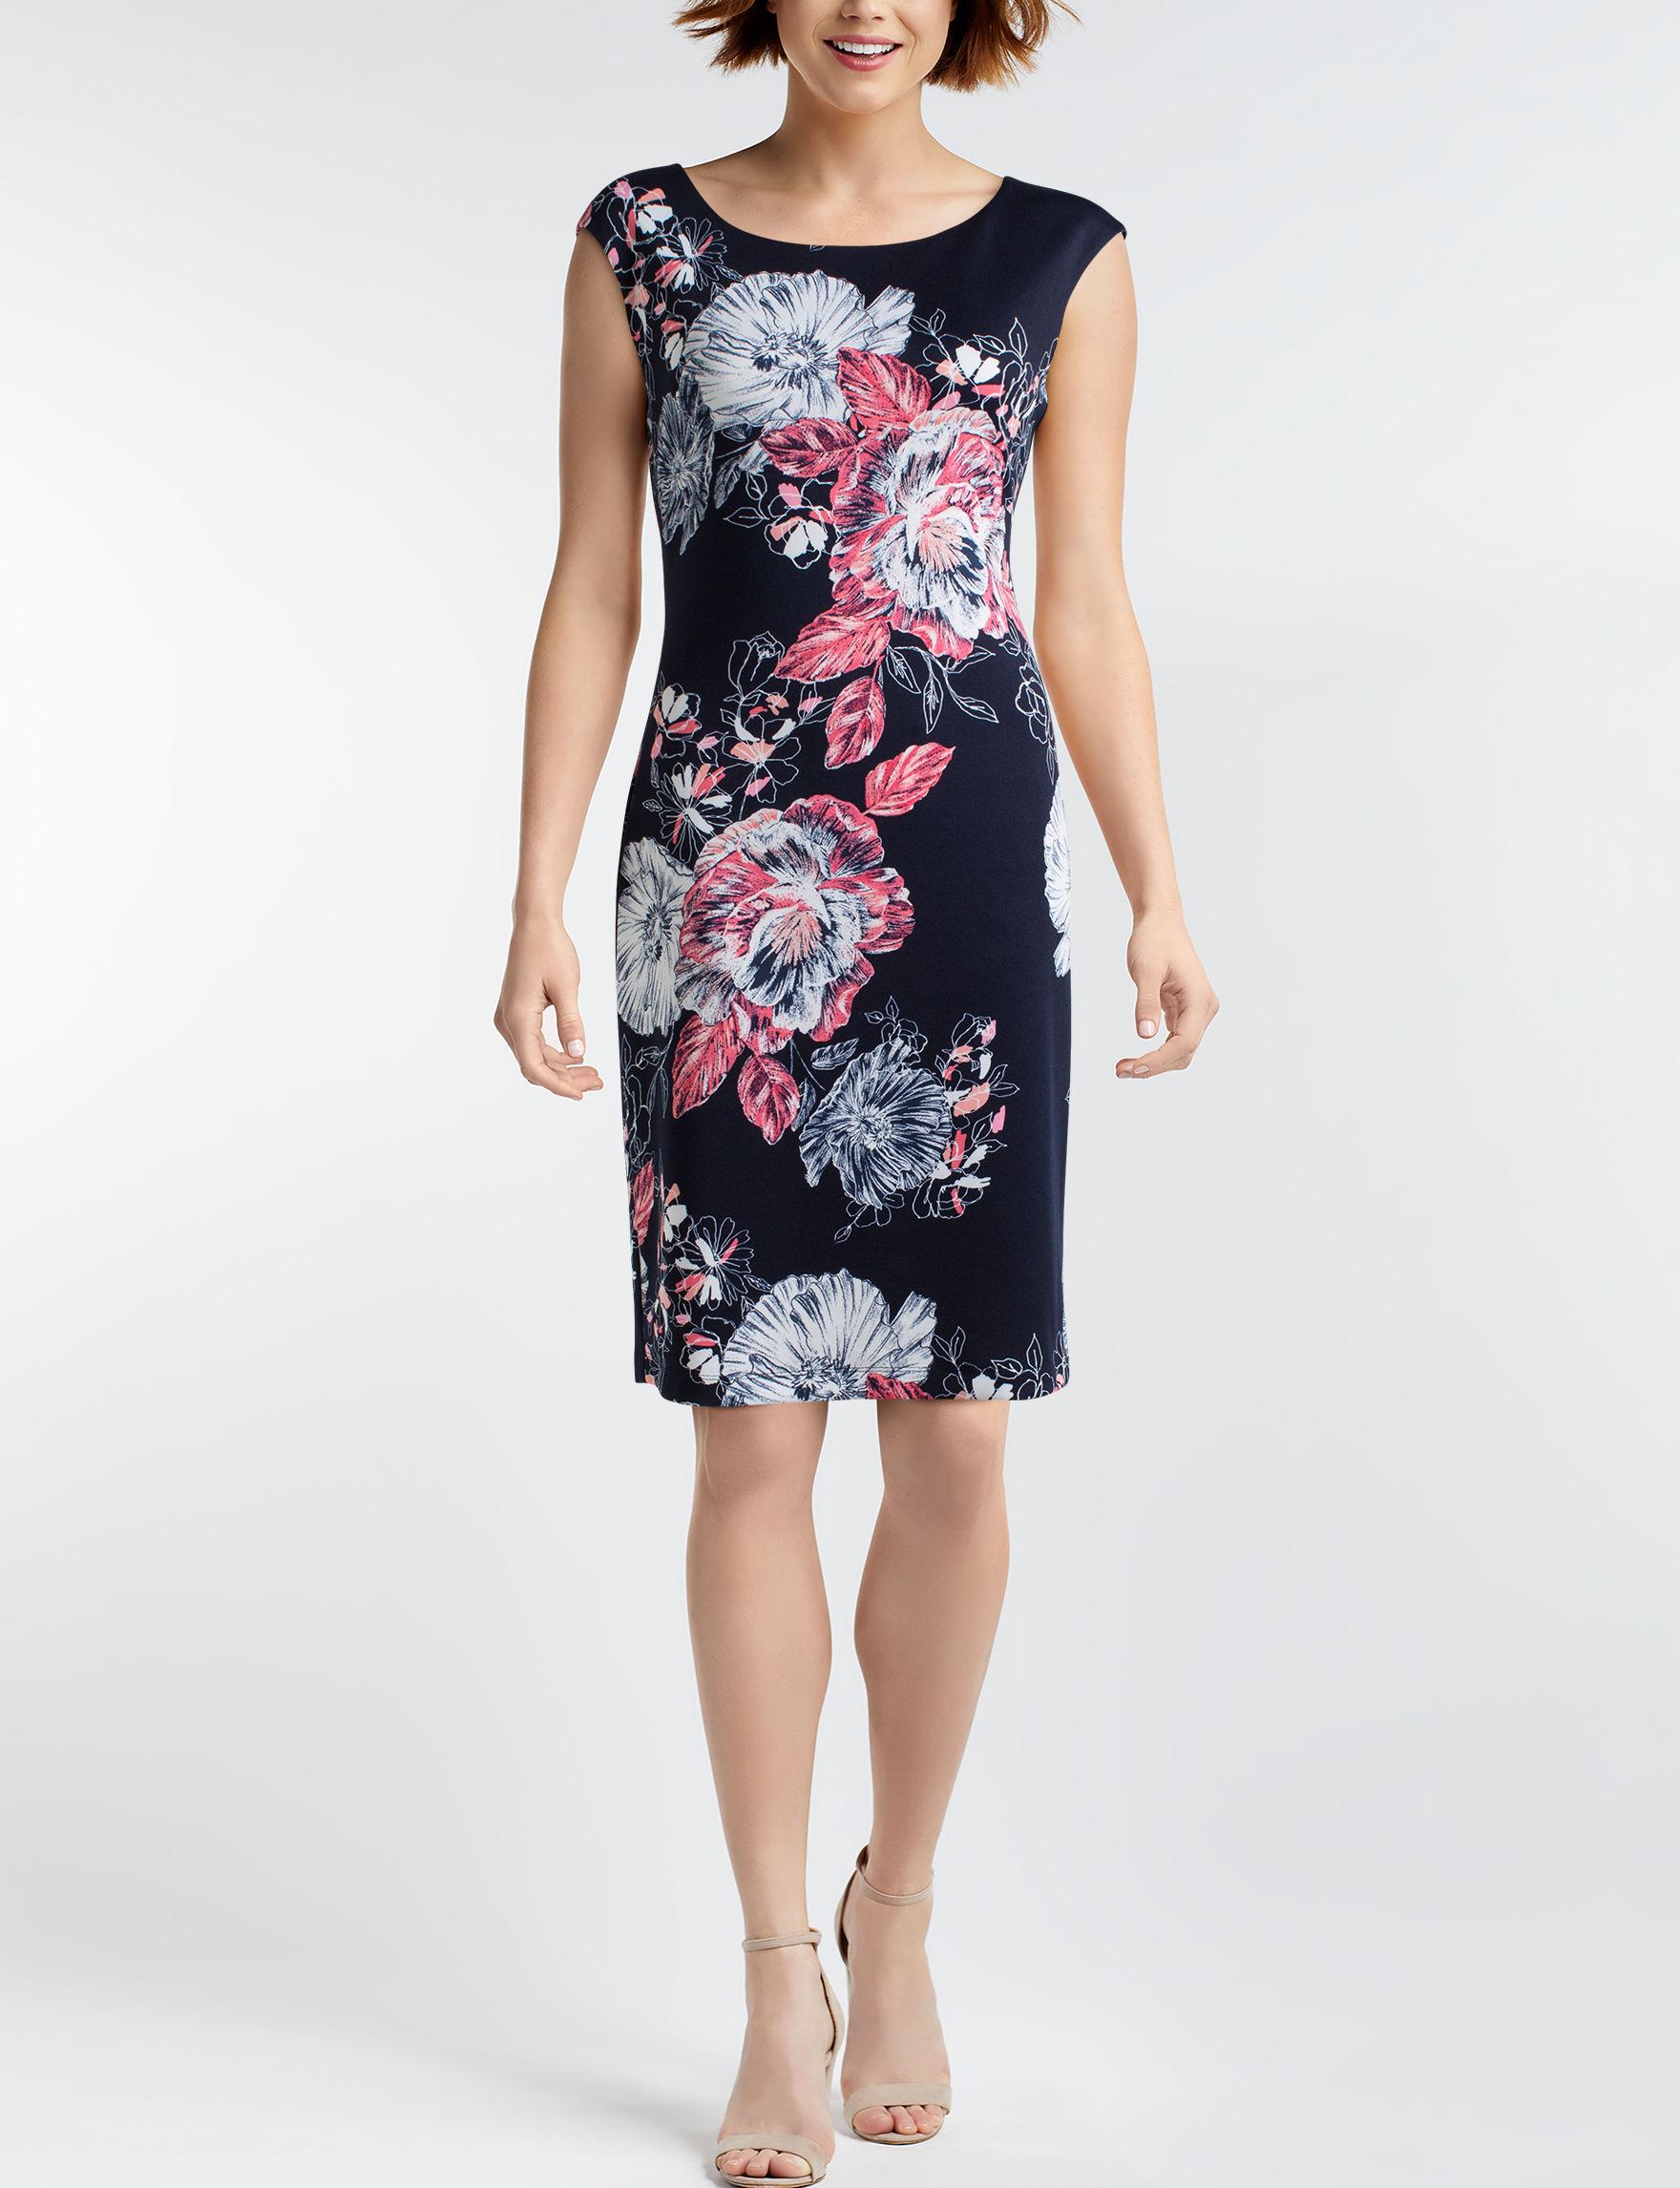 Connected Black Floral Everyday & Casual Scuba Dresses Sheath Dresses